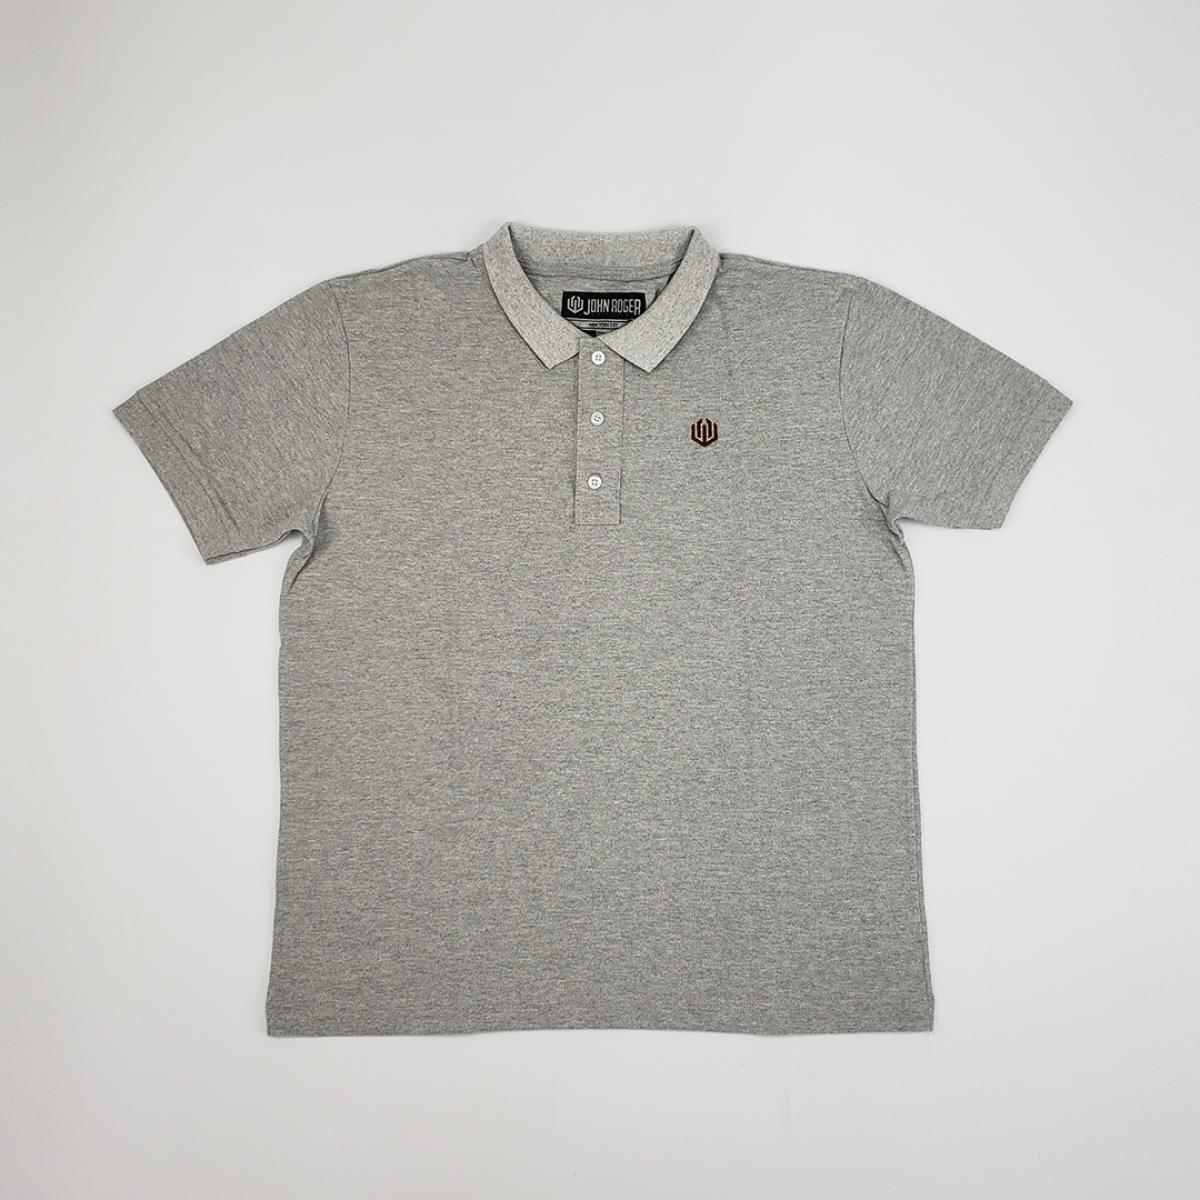 Camisa Polo - John Roger 2